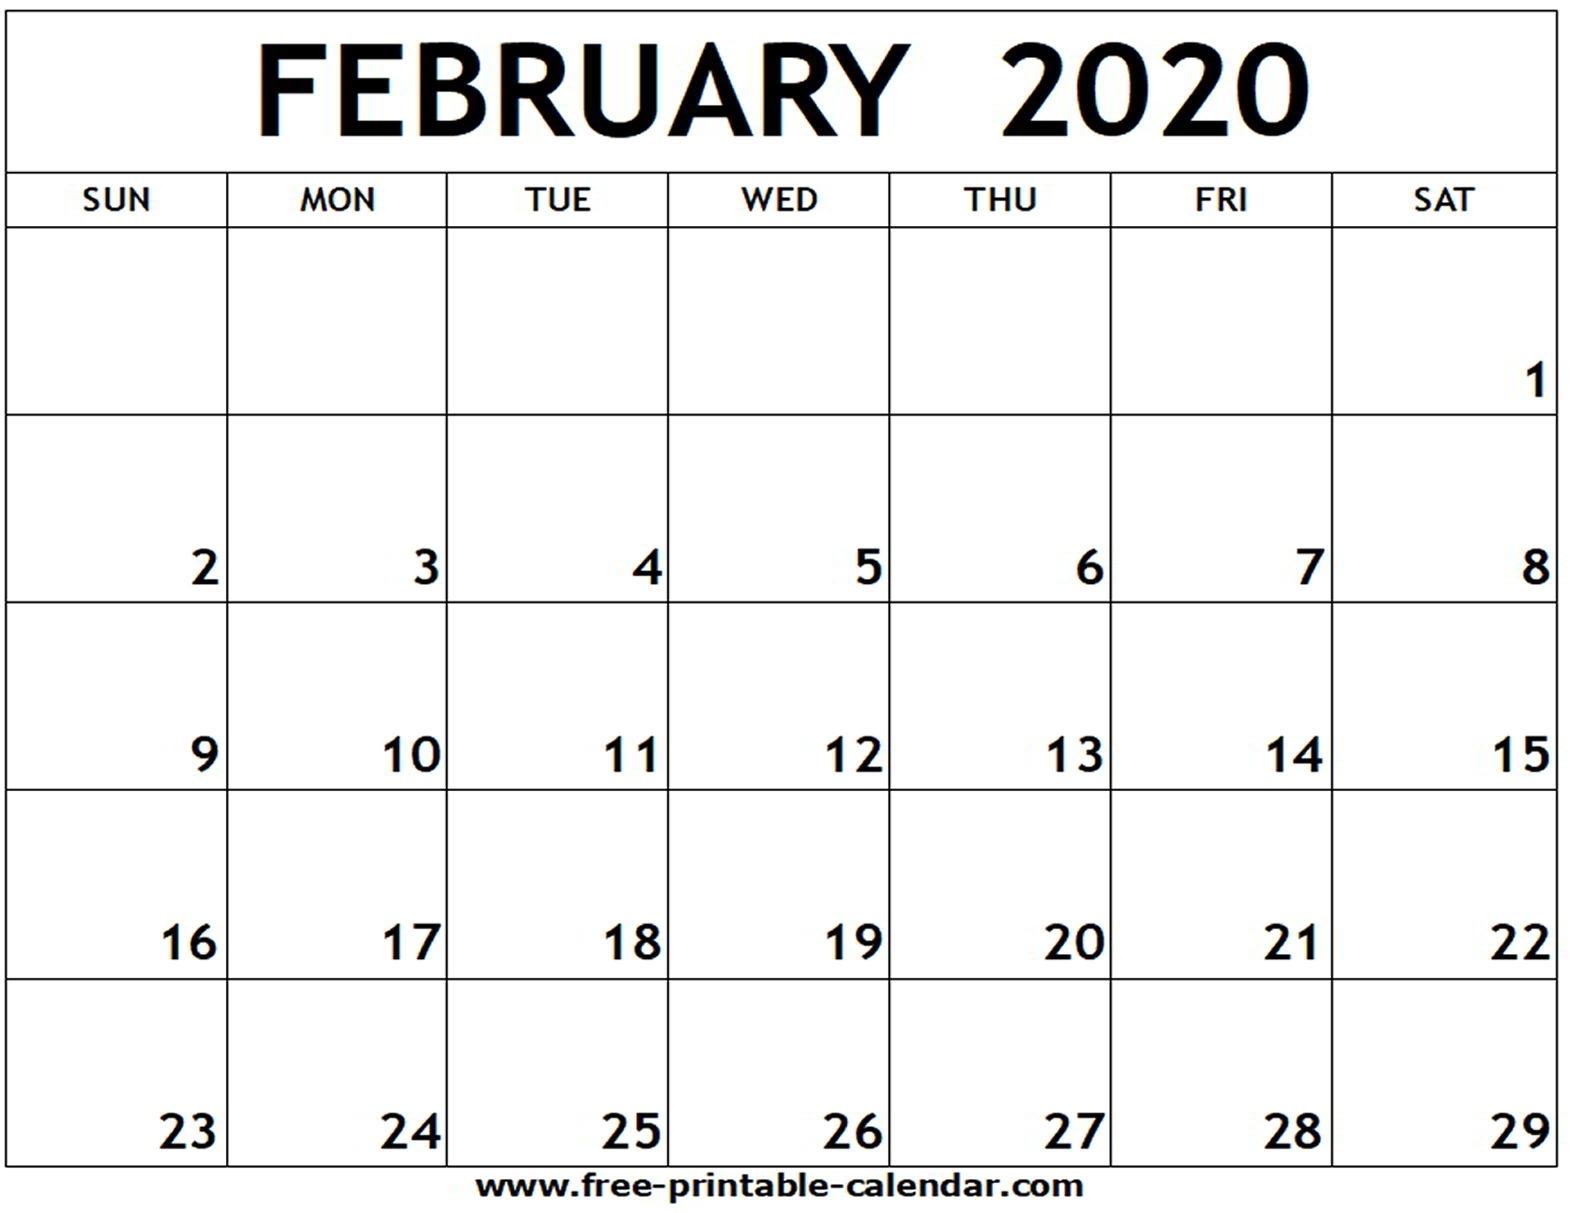 Feb Calendar 2020 - Firuse.rsd7 Incredible 2020 Printable Calendars Including Holidays And Jewish Holidays